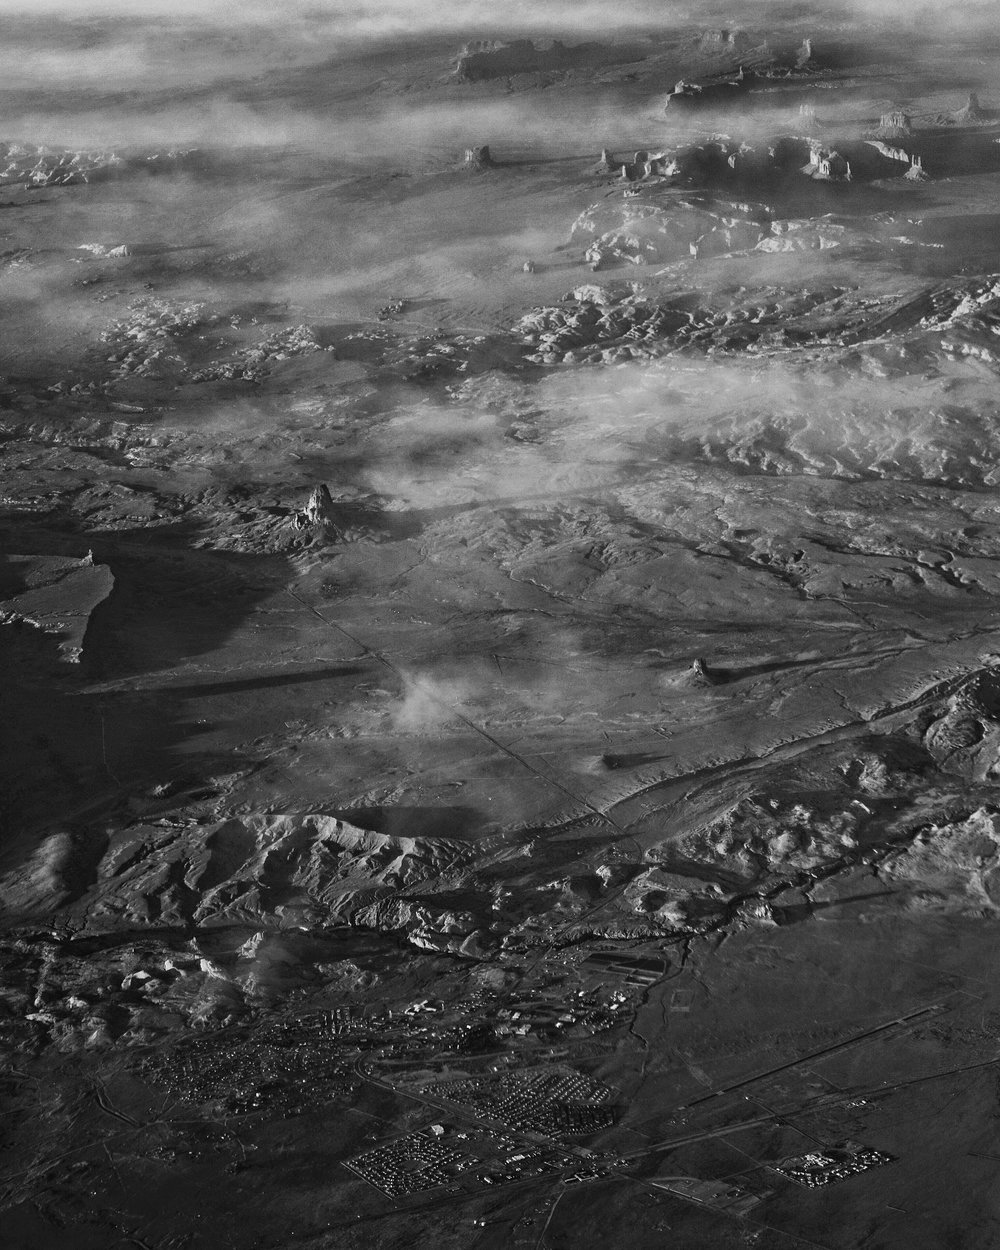 Kayenta, Agathla Peak, and Monument Valley